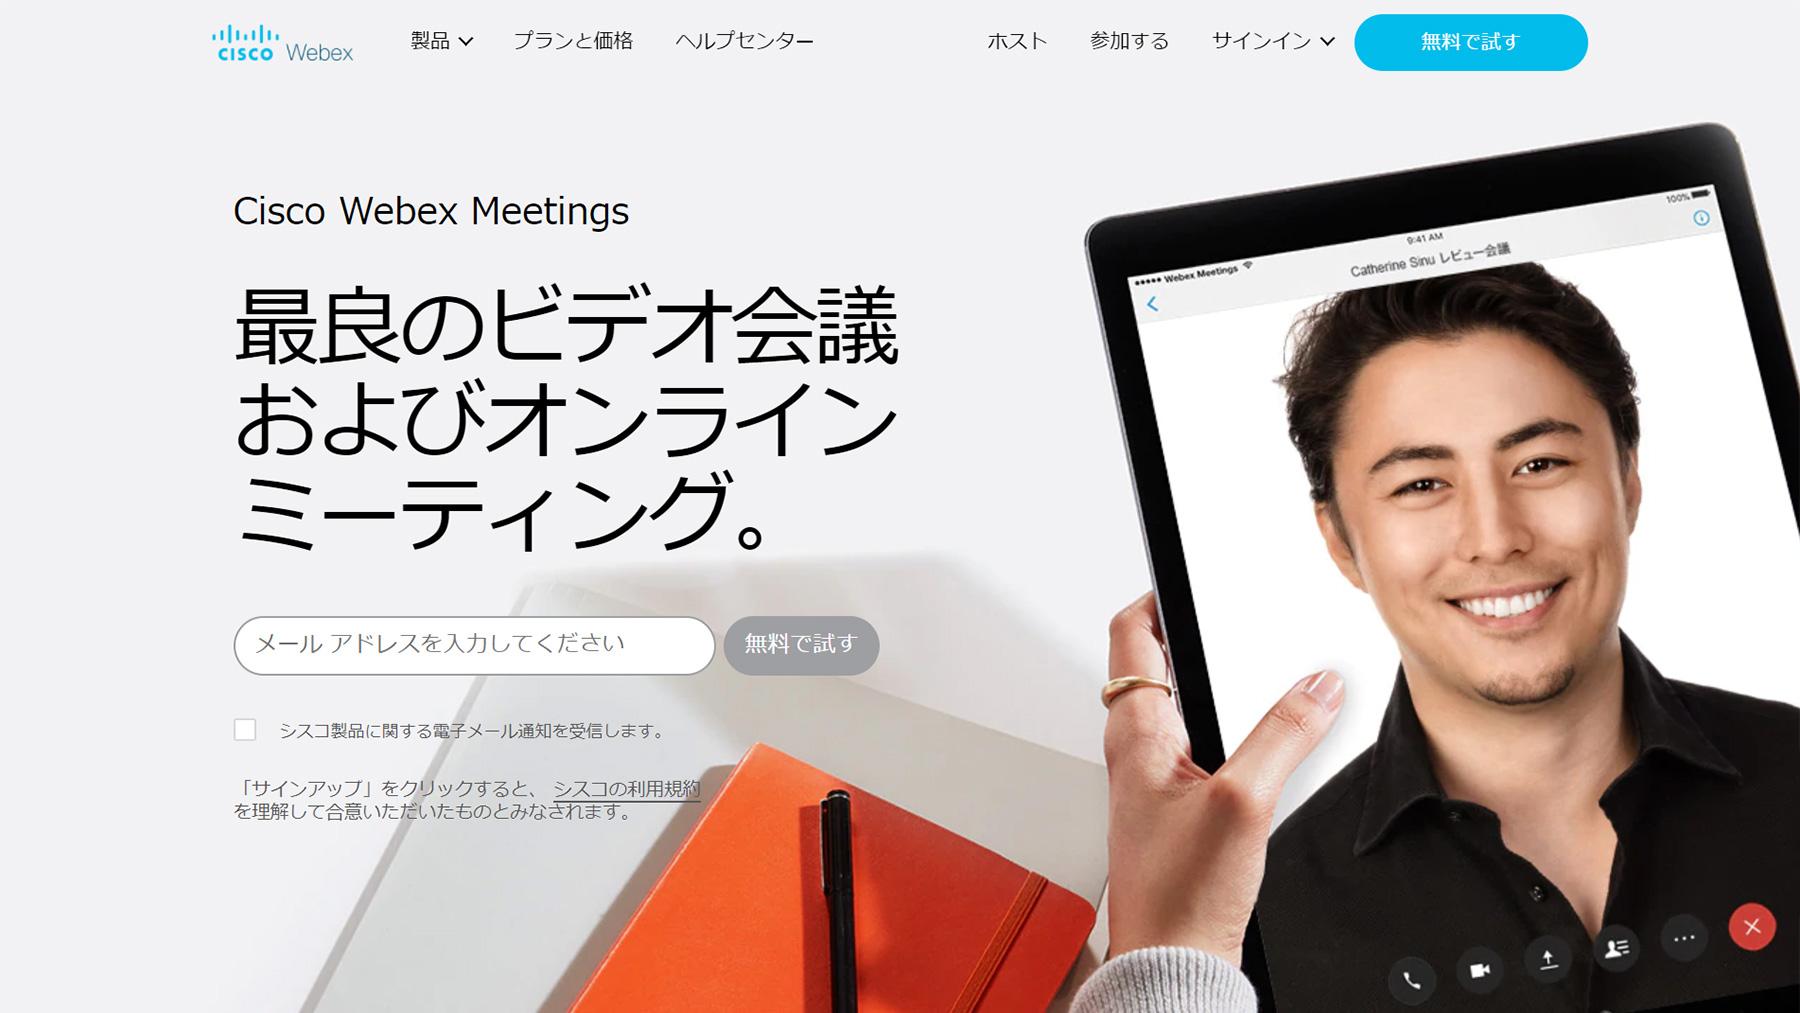 Cisco Webex Meetings公式Webサイト